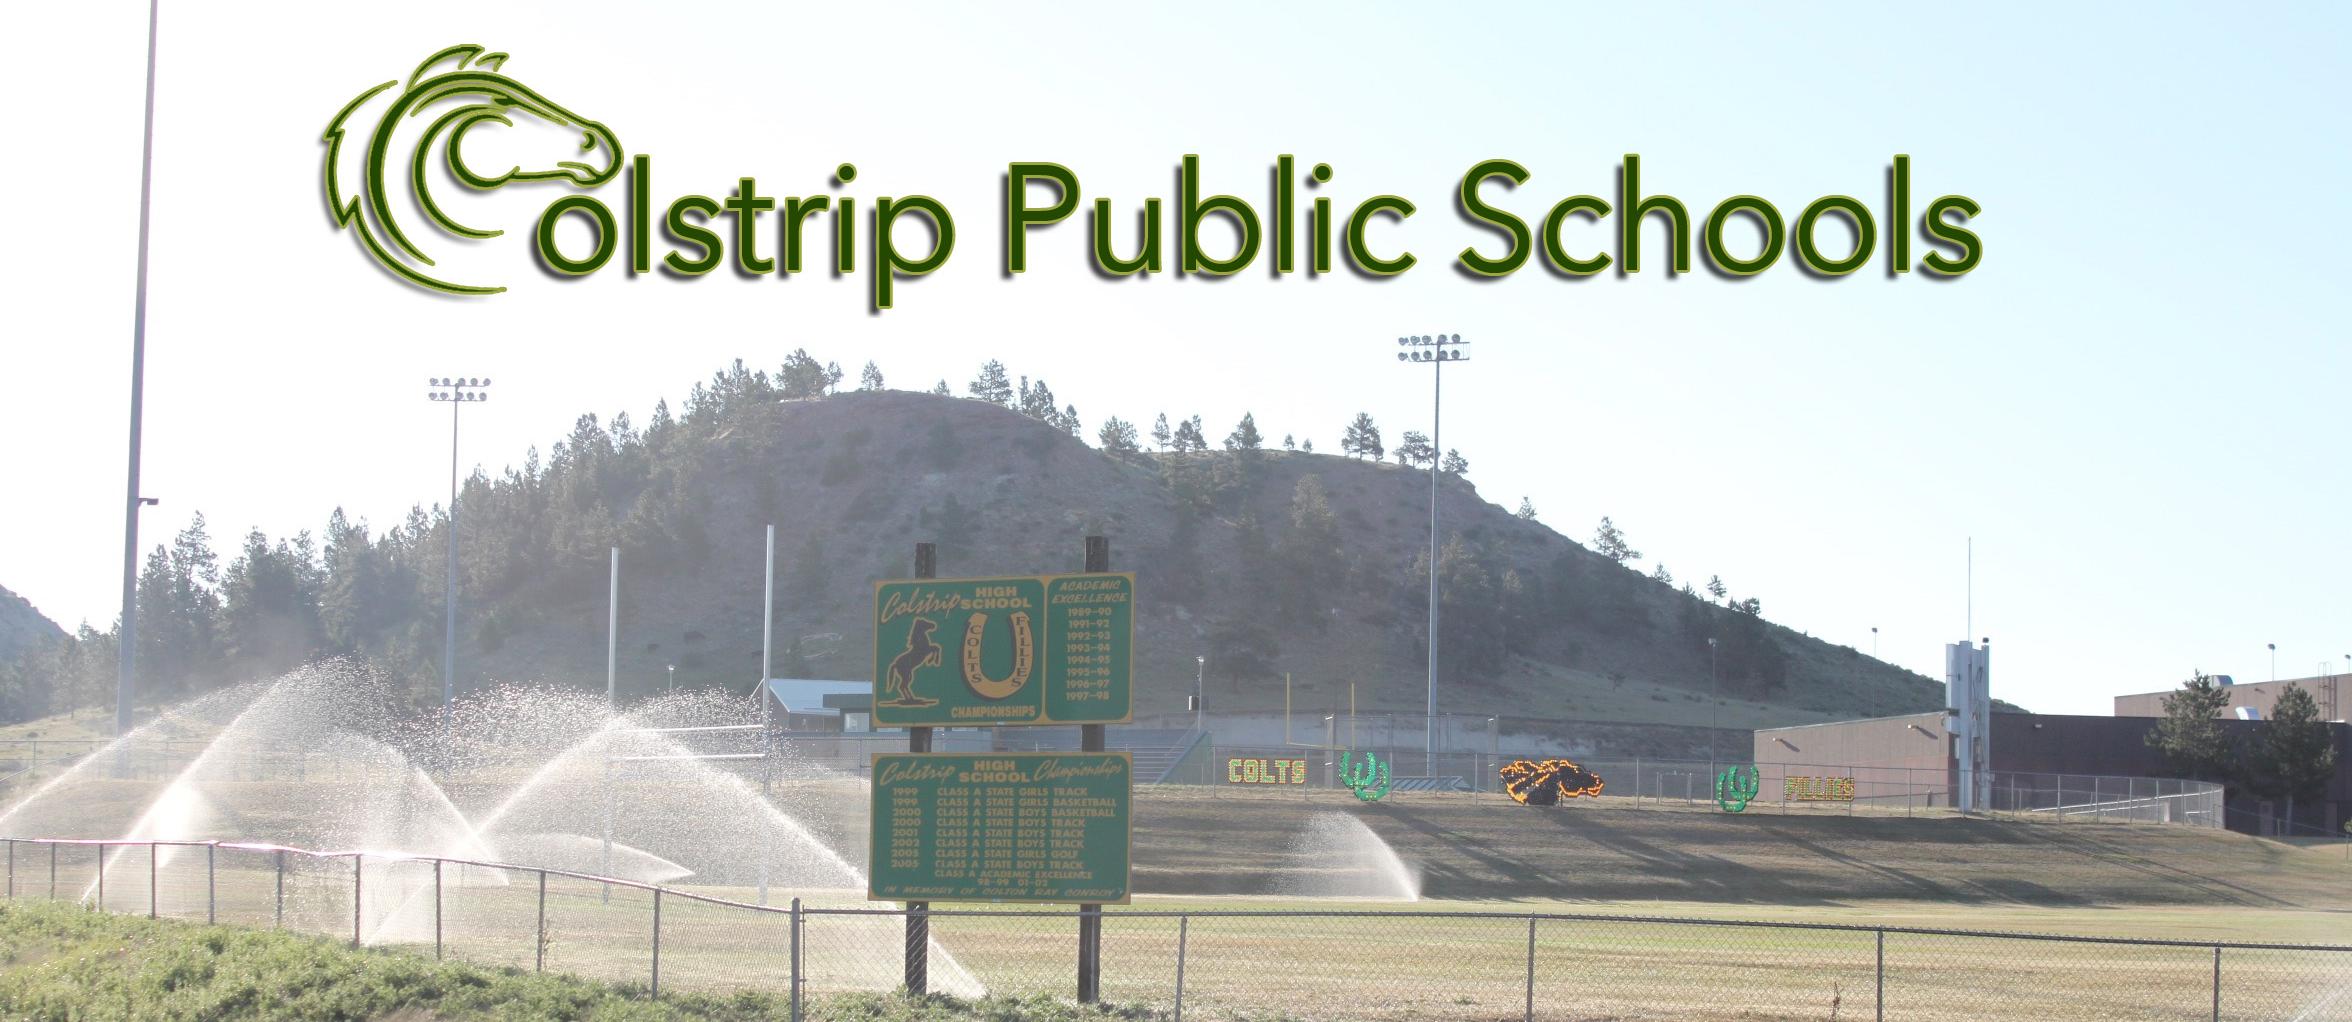 High School Grounds